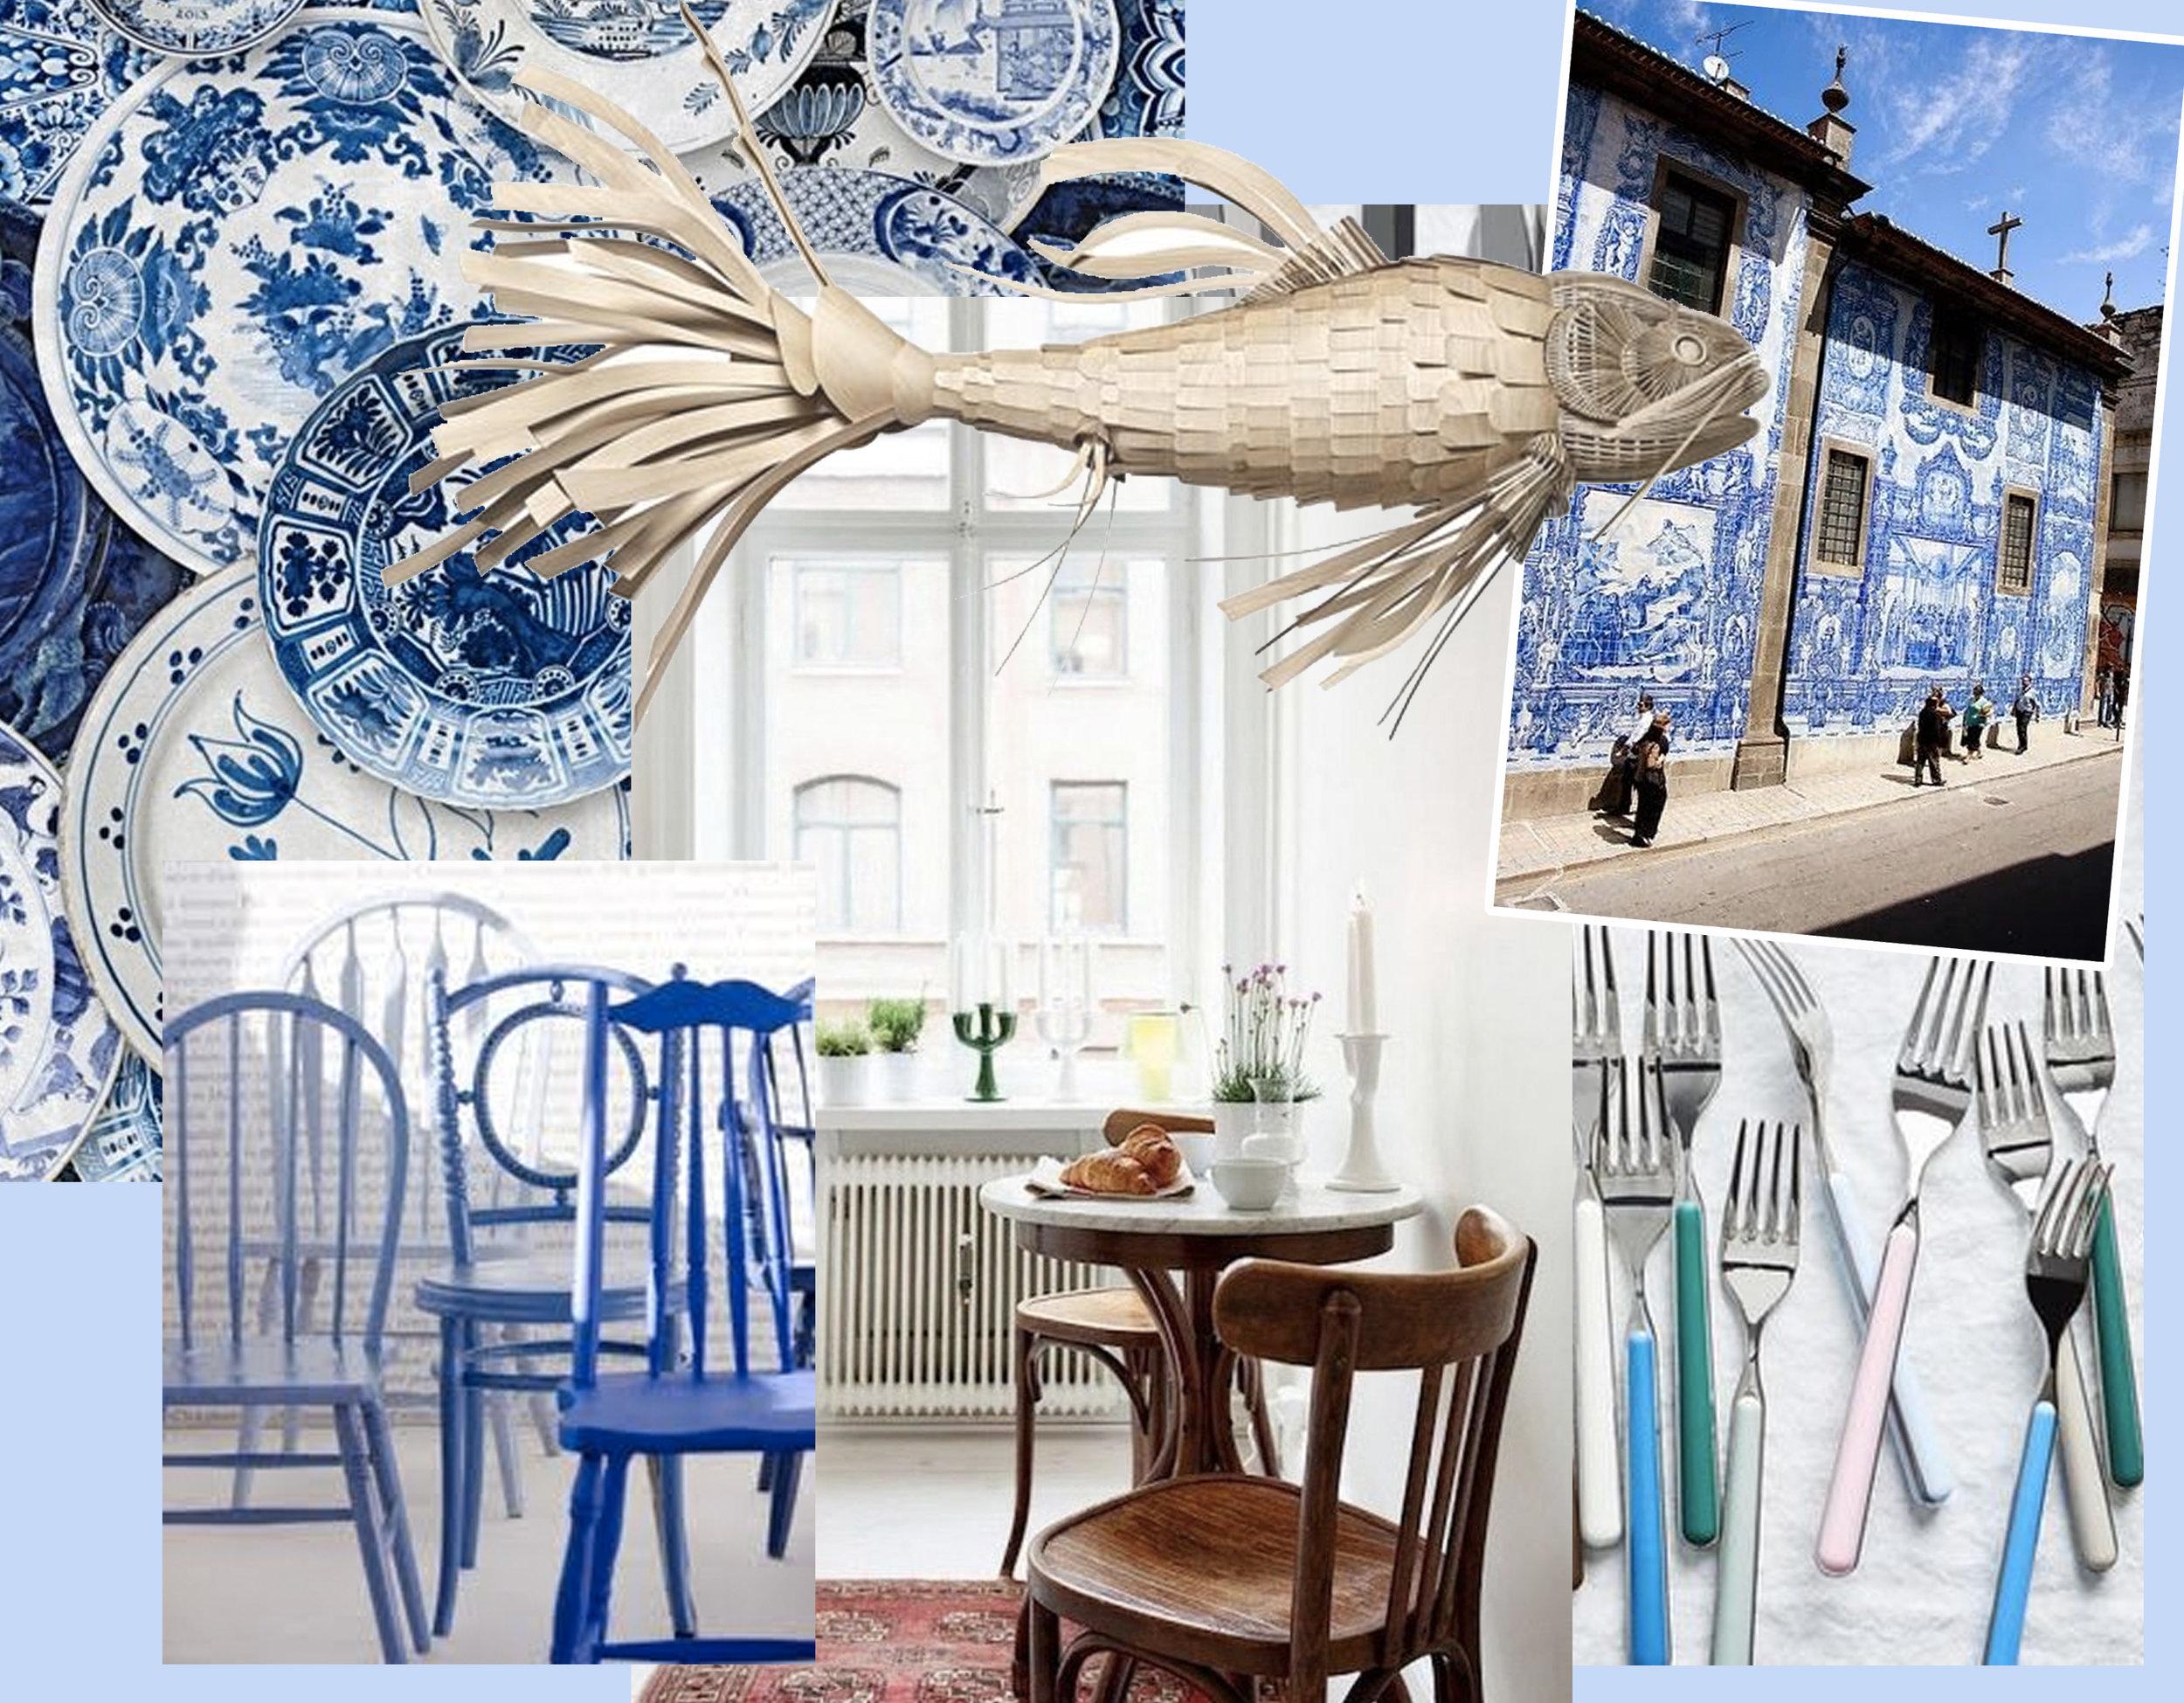 Delftware wallpaper  Mind The Gap  - blue painted chairs via  Daily Imprint  - breakfast corner via  My Scandinavian Home  - Koi pendant lamp  LZF  - facade in Porto via  Flickr  - Fantasia, Italian flatware  Food52